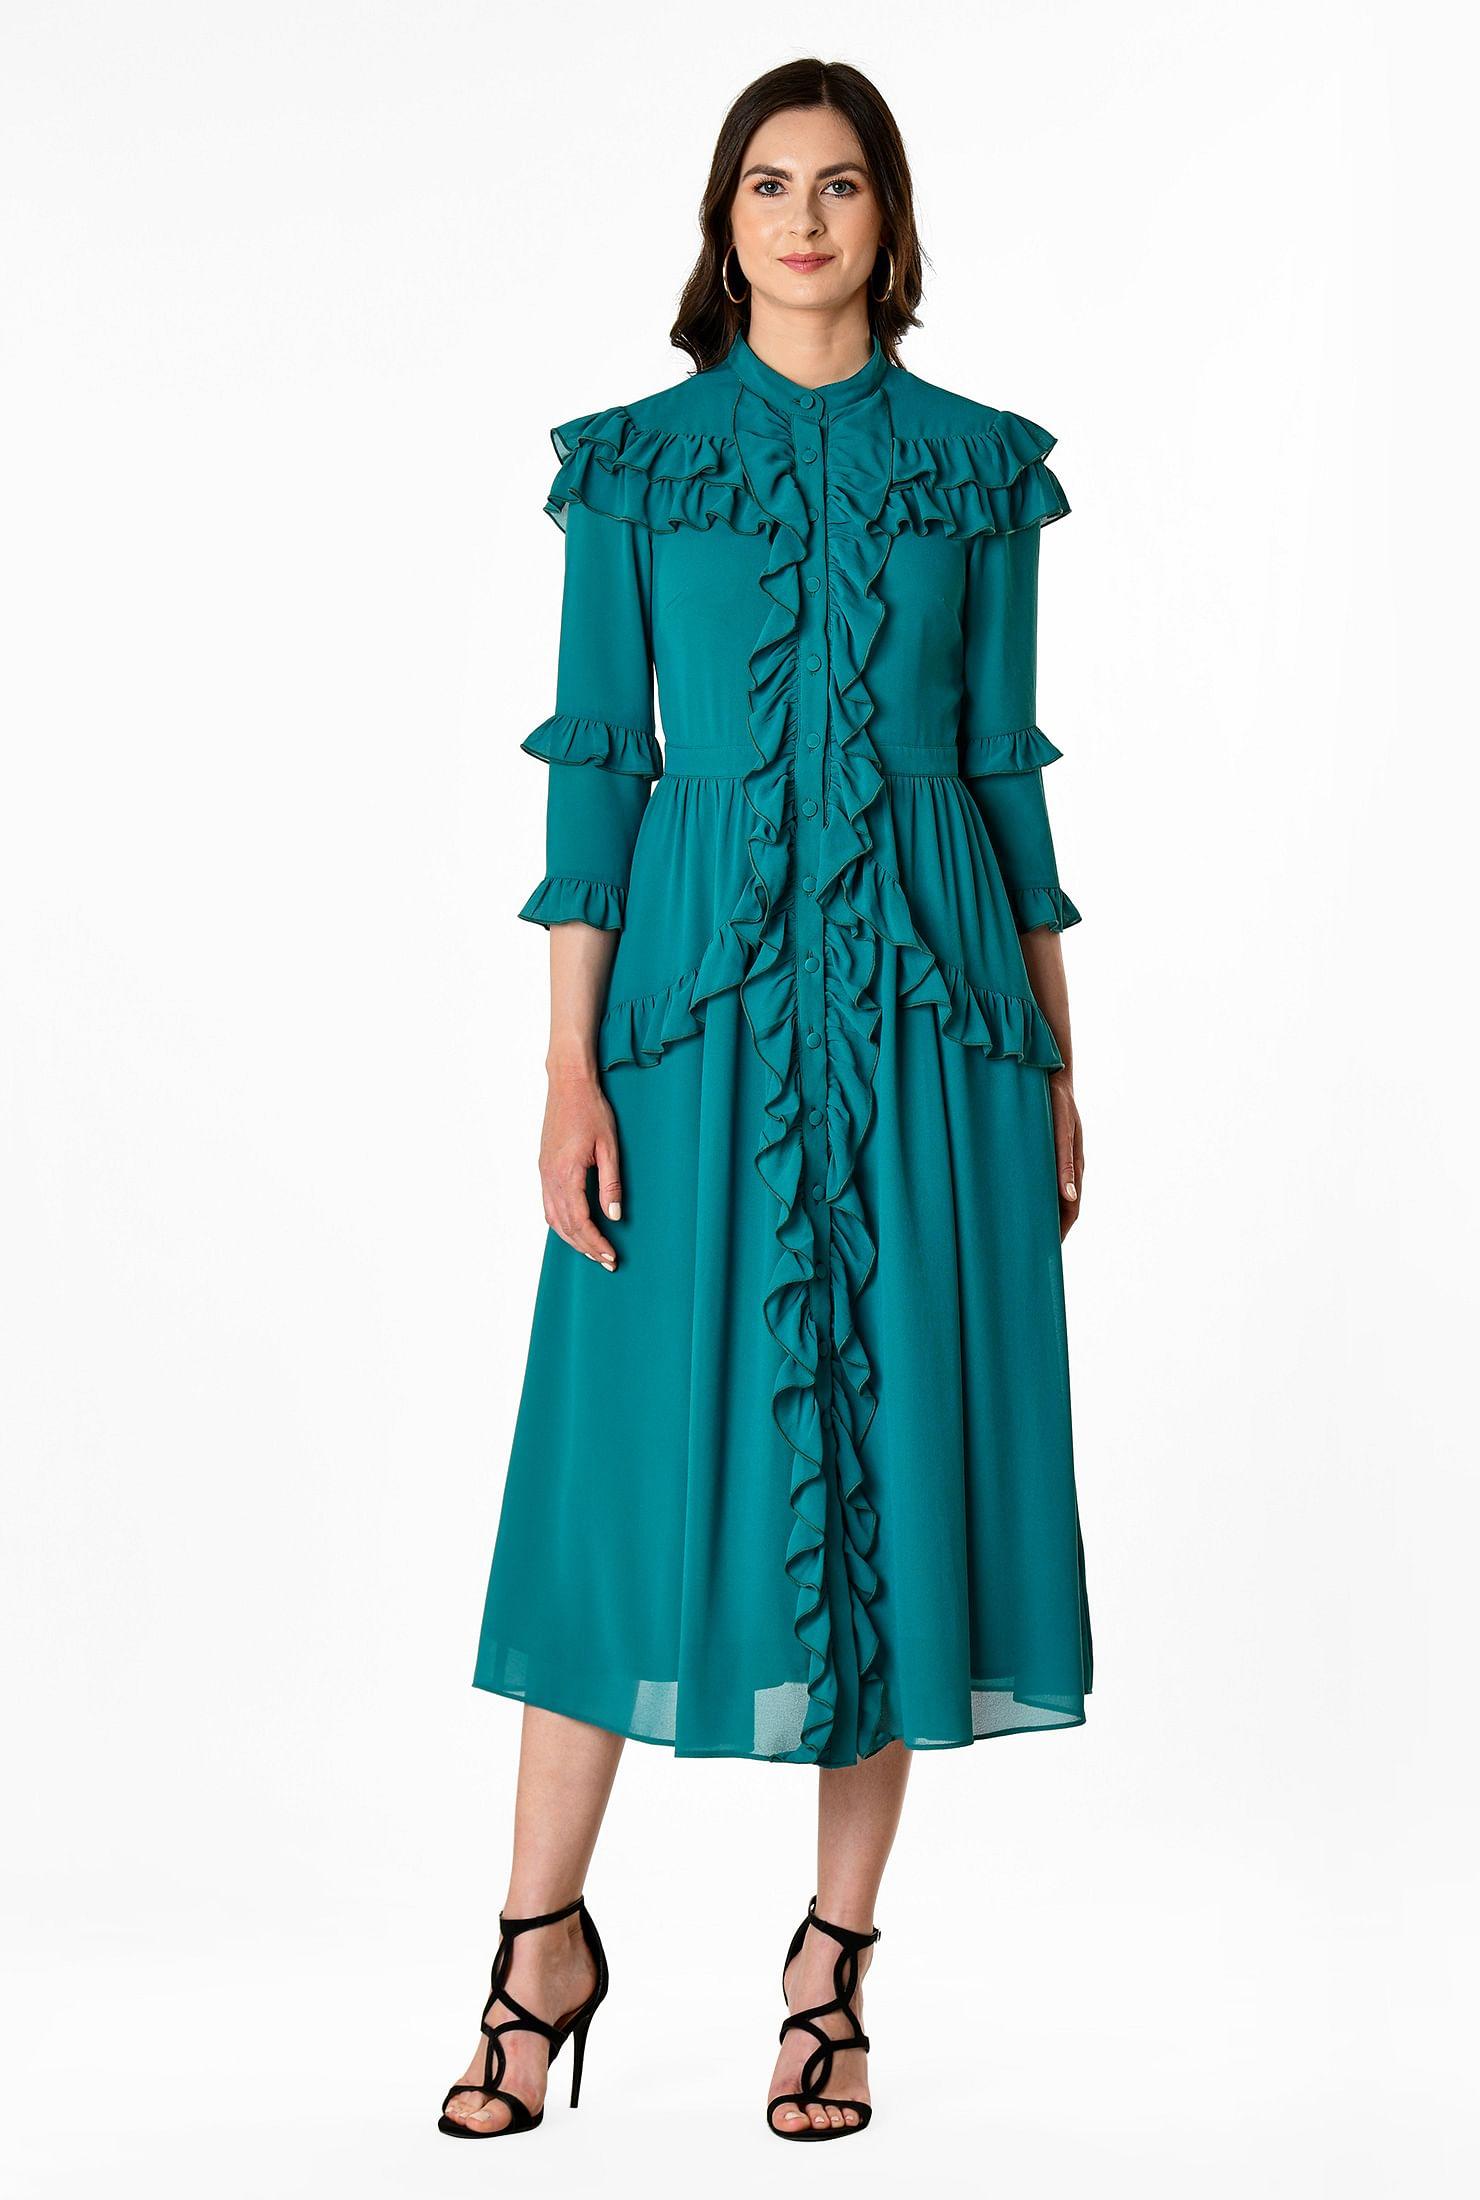 1930s Day Dresses, Afternoon Dresses History Ruffle trim chiffon shirtdress $89.95 AT vintagedancer.com